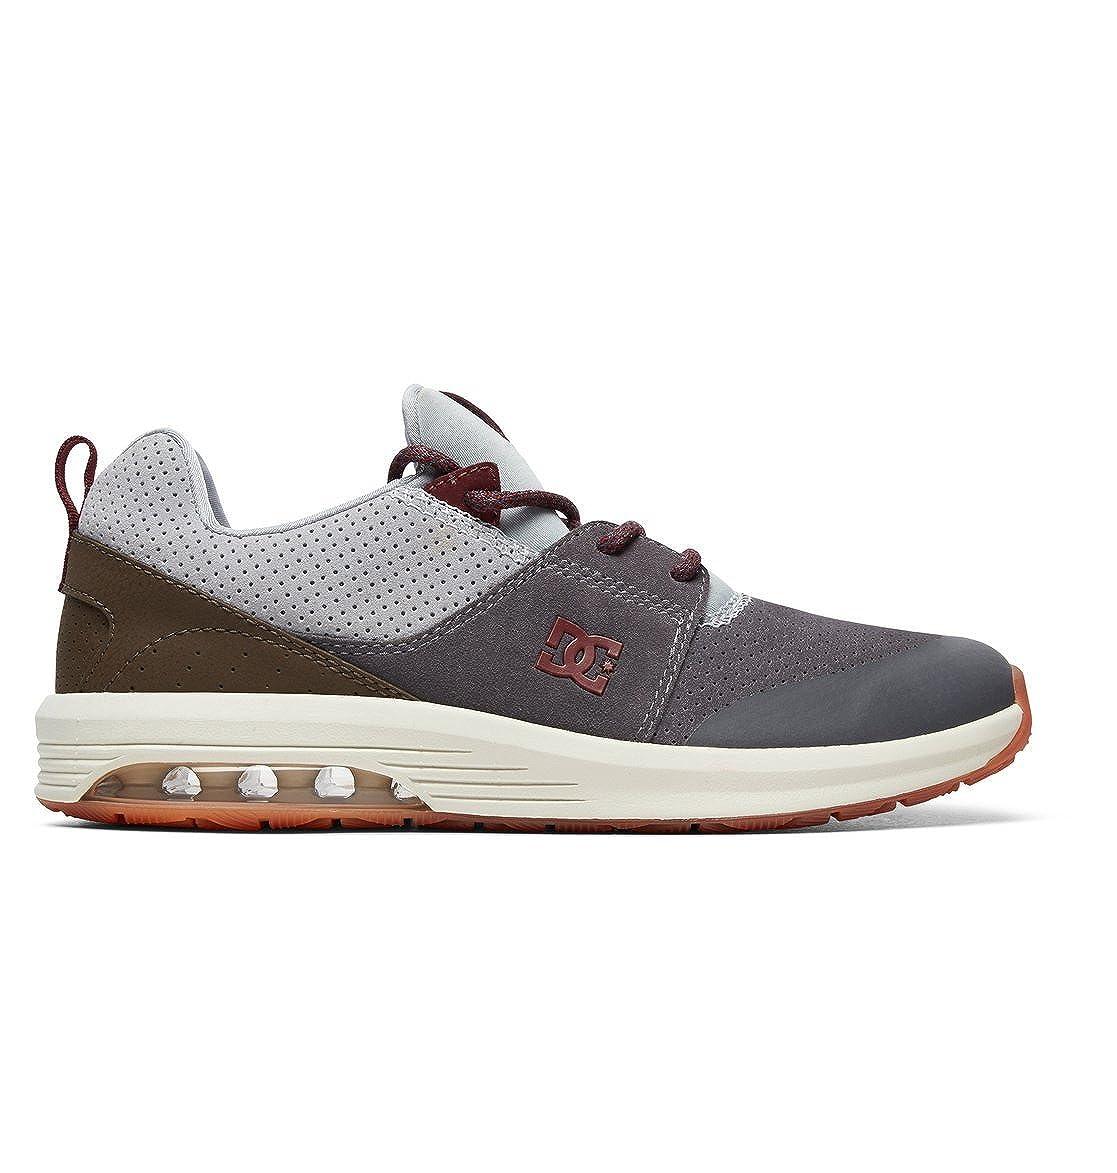 DC schuhe Heathrow IA Prestige - Schuhe Schuhe Schuhe für Männer ADYS200063 97fd52